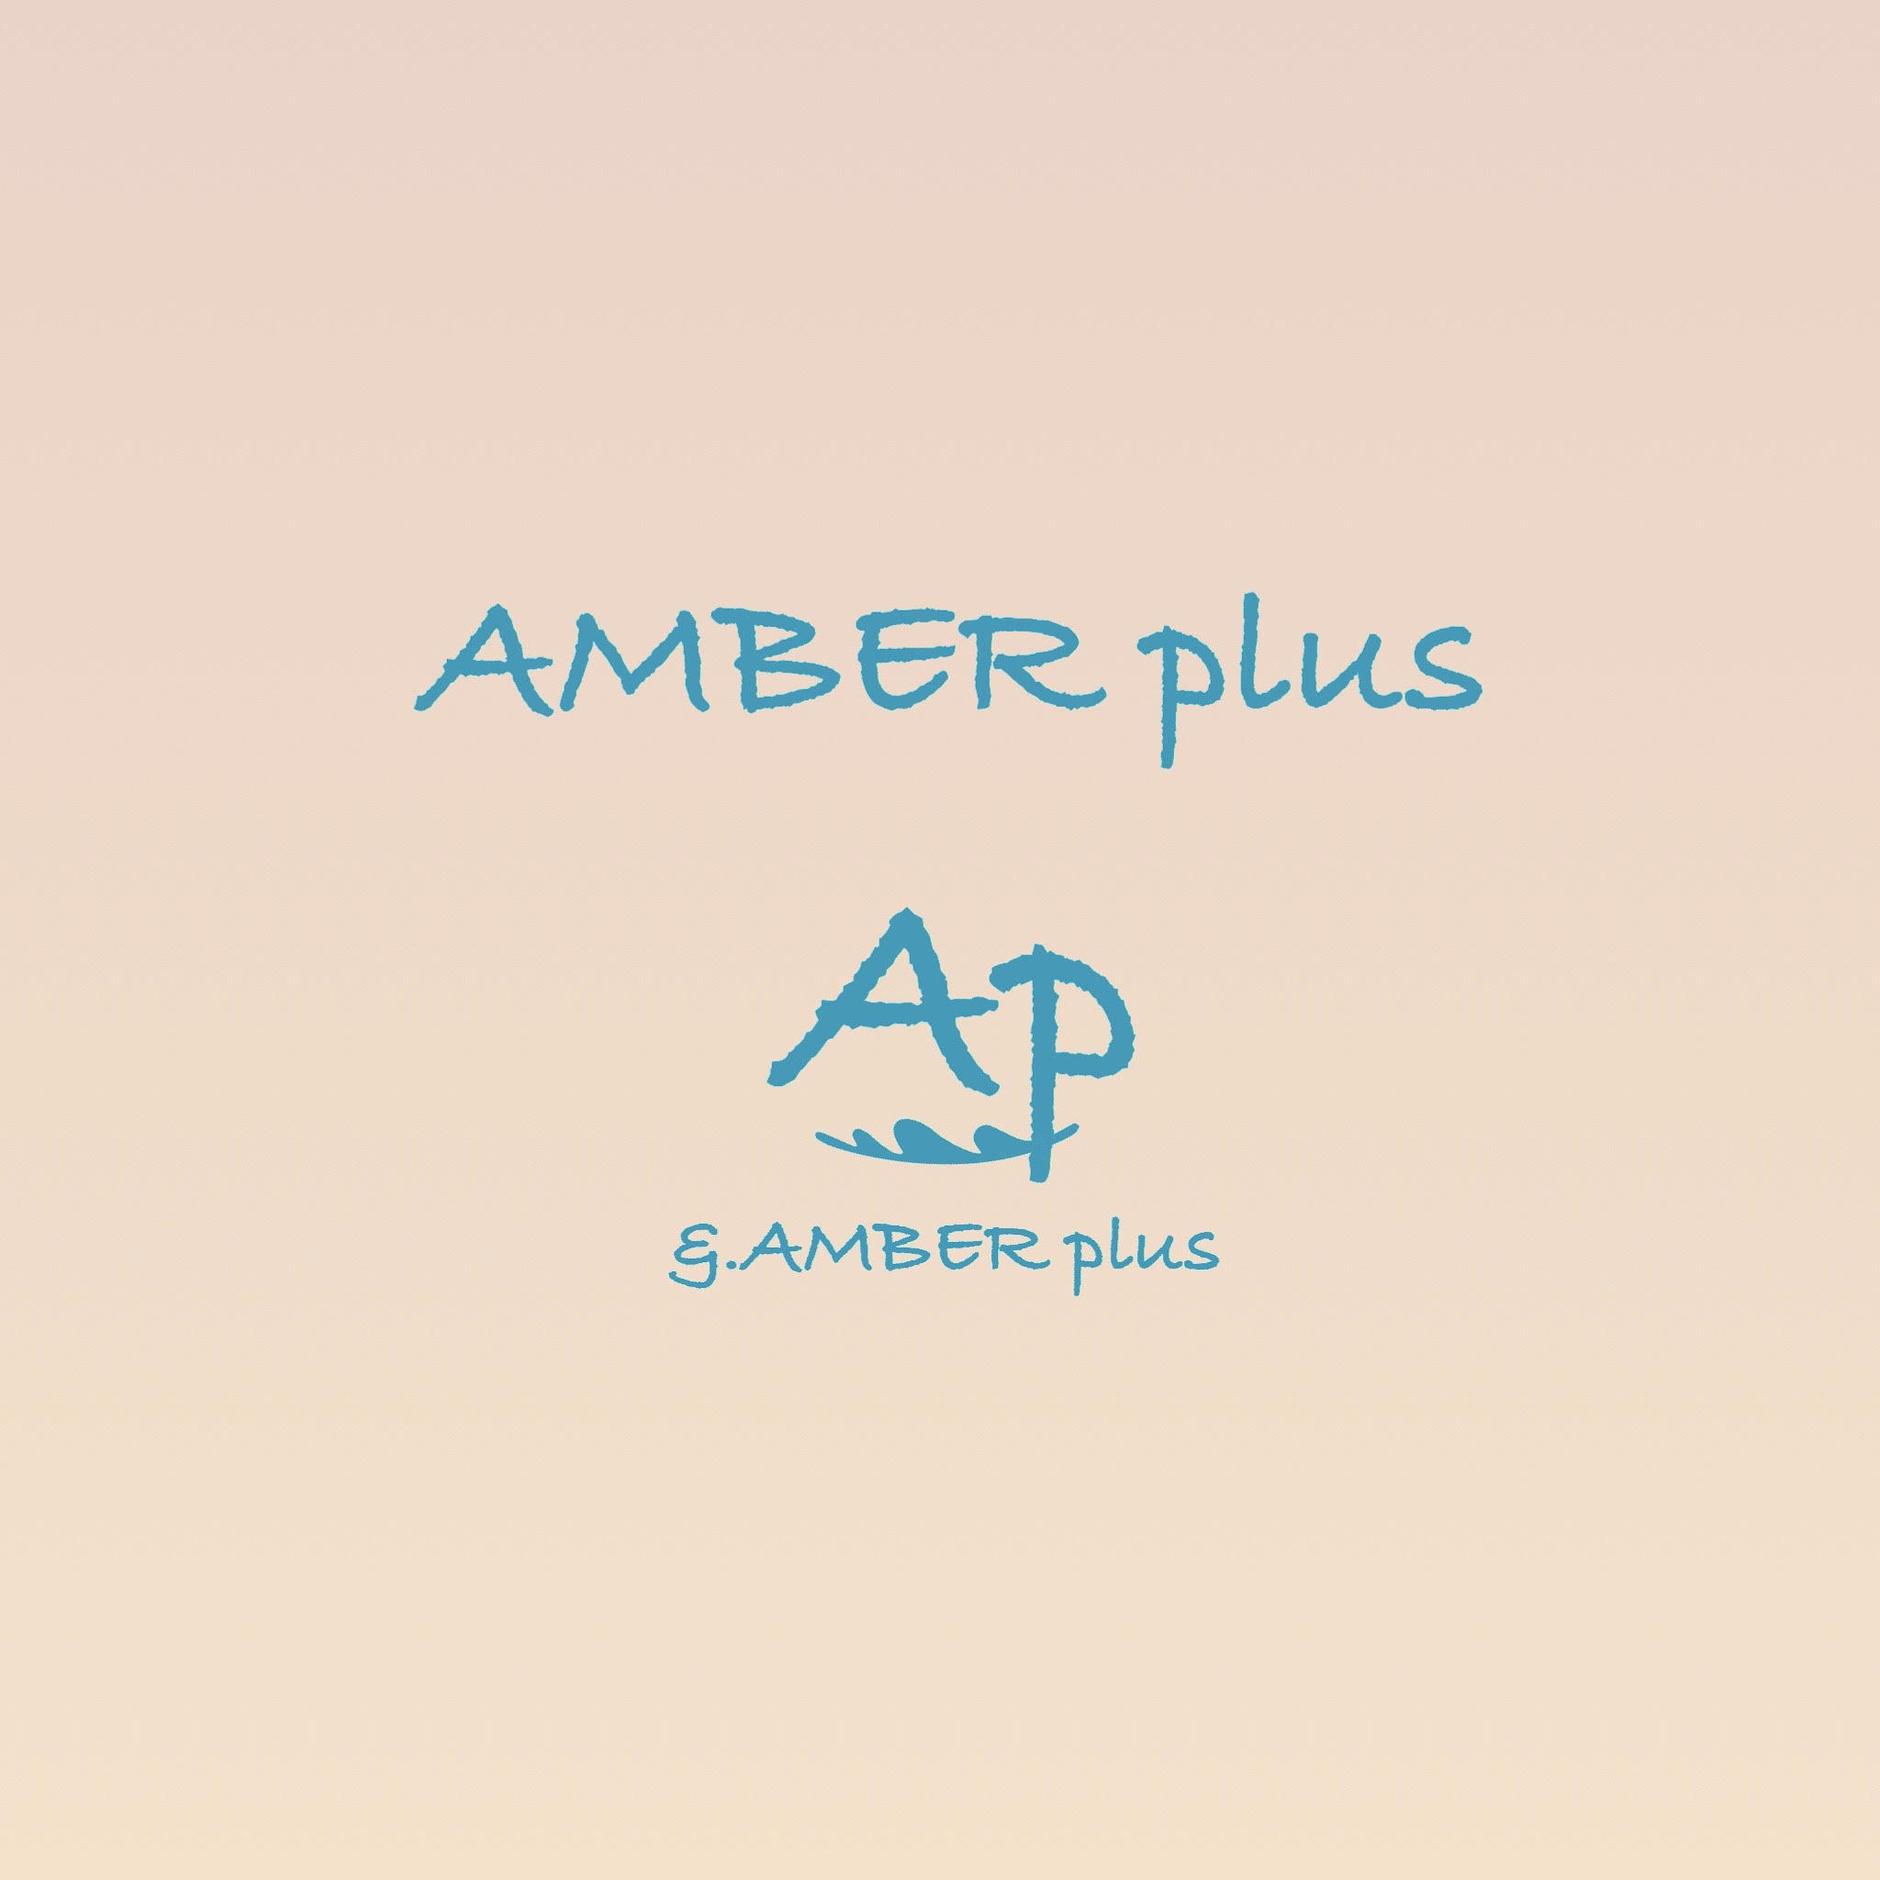 AMBER plus